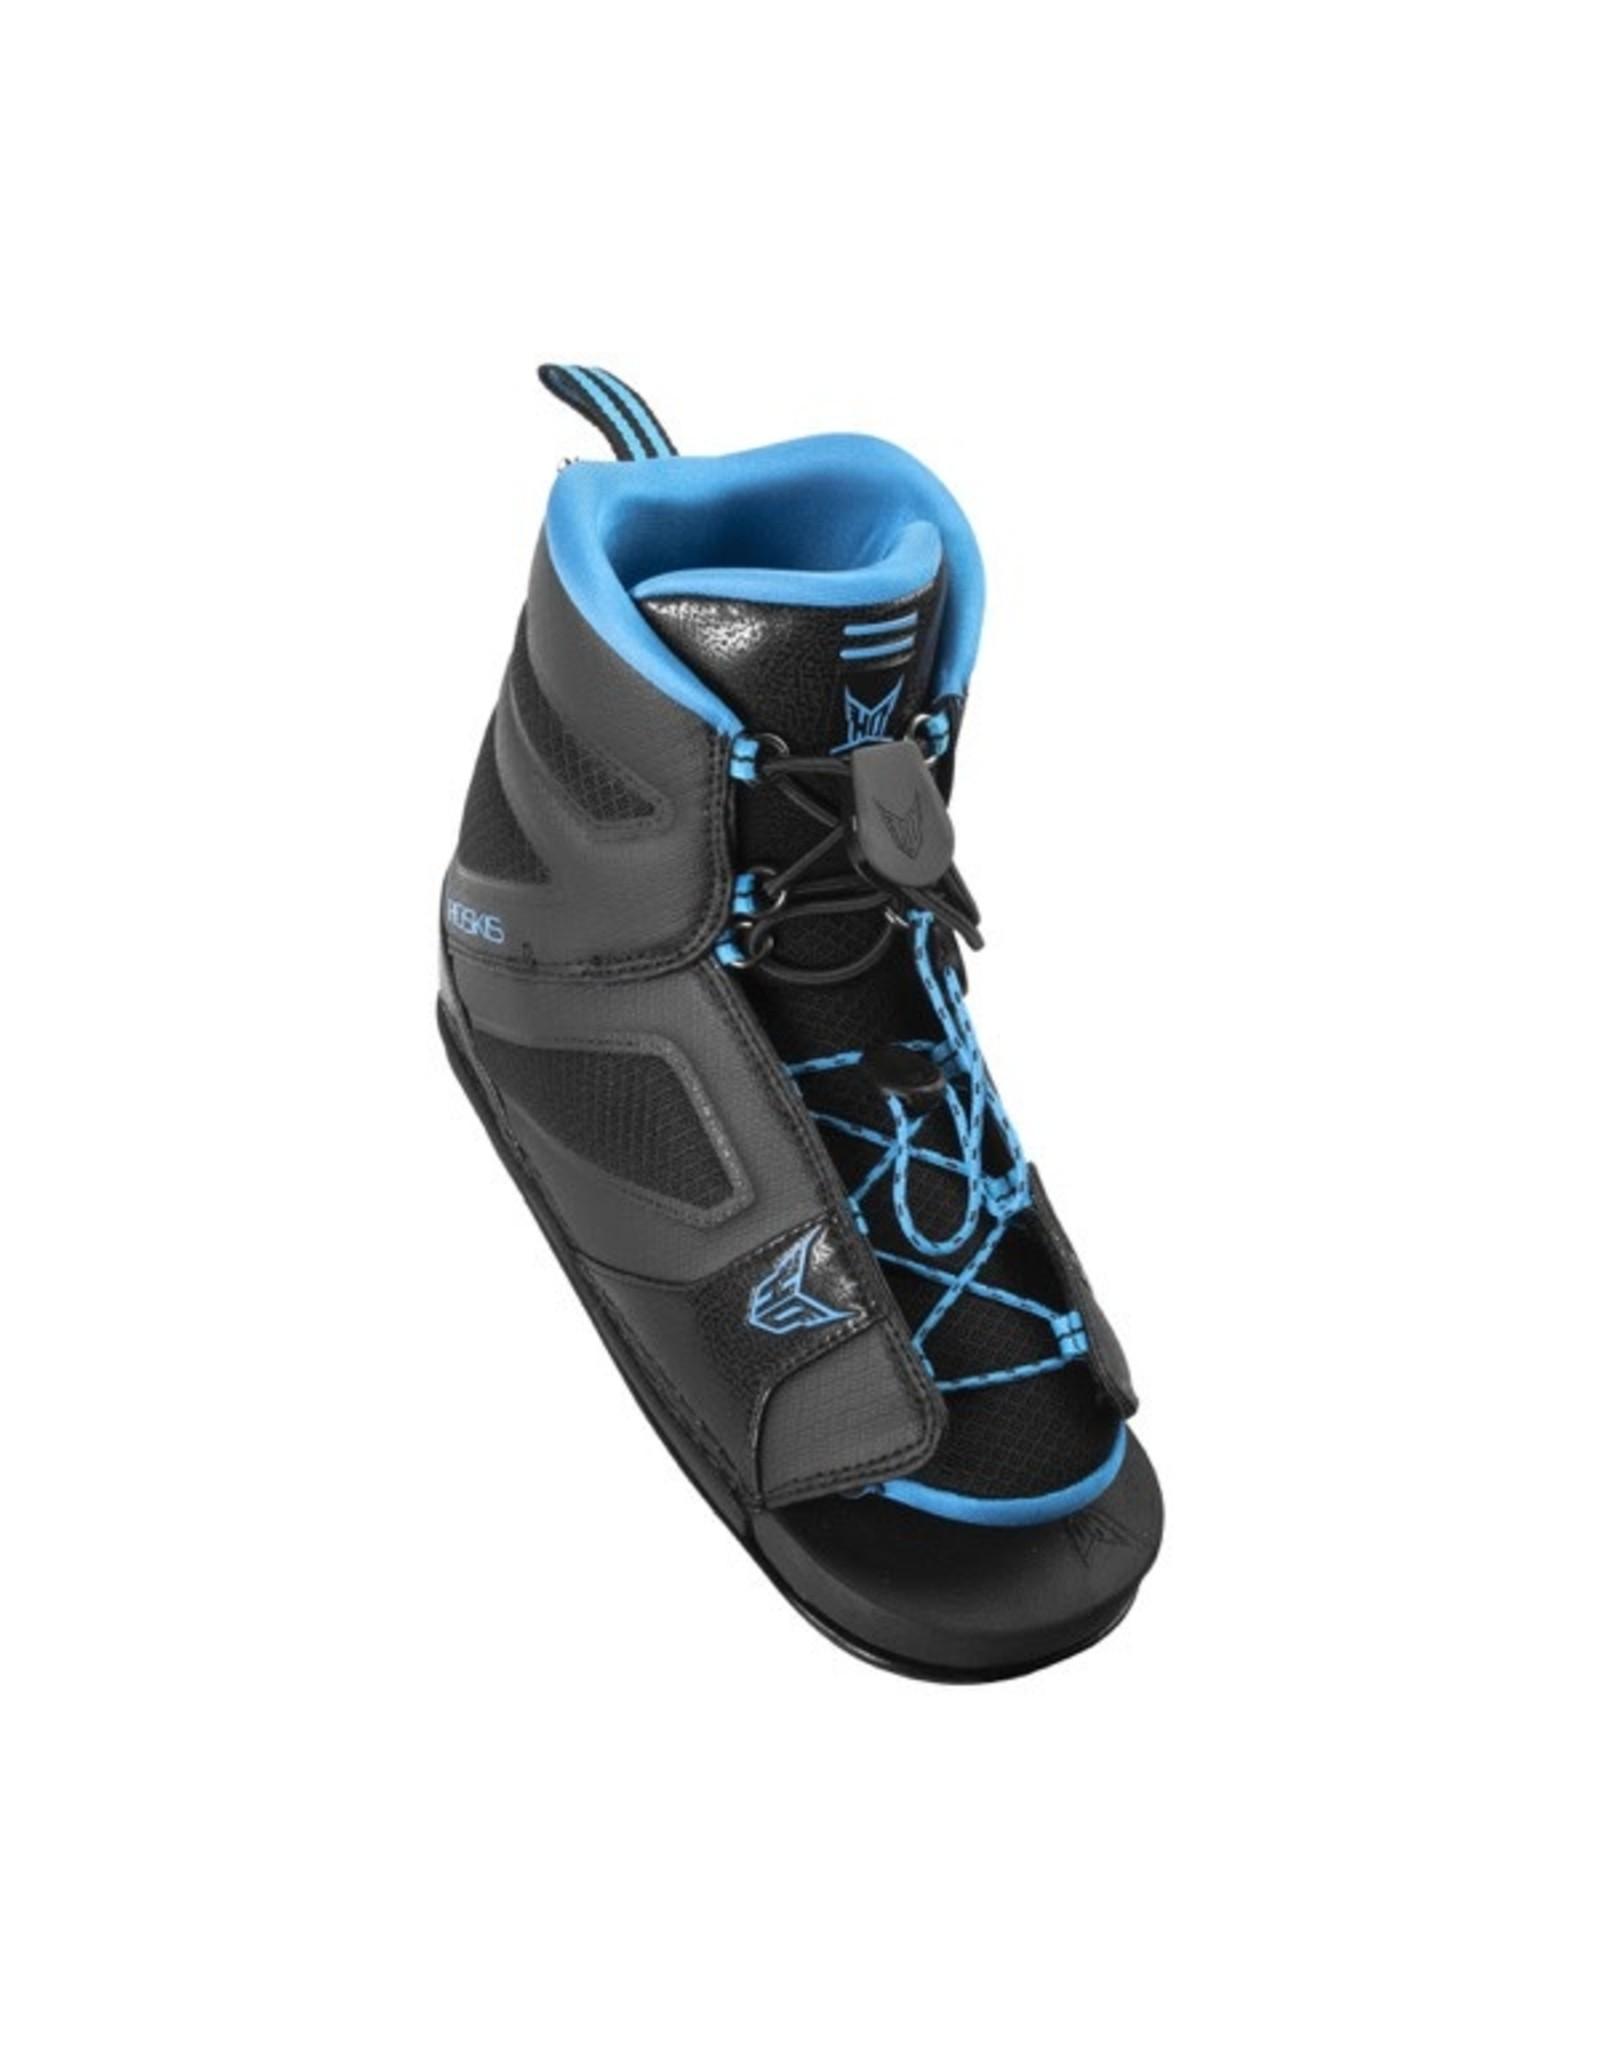 HO/Hyperlite FreeMax Direct Connect Slalom Boot 2019